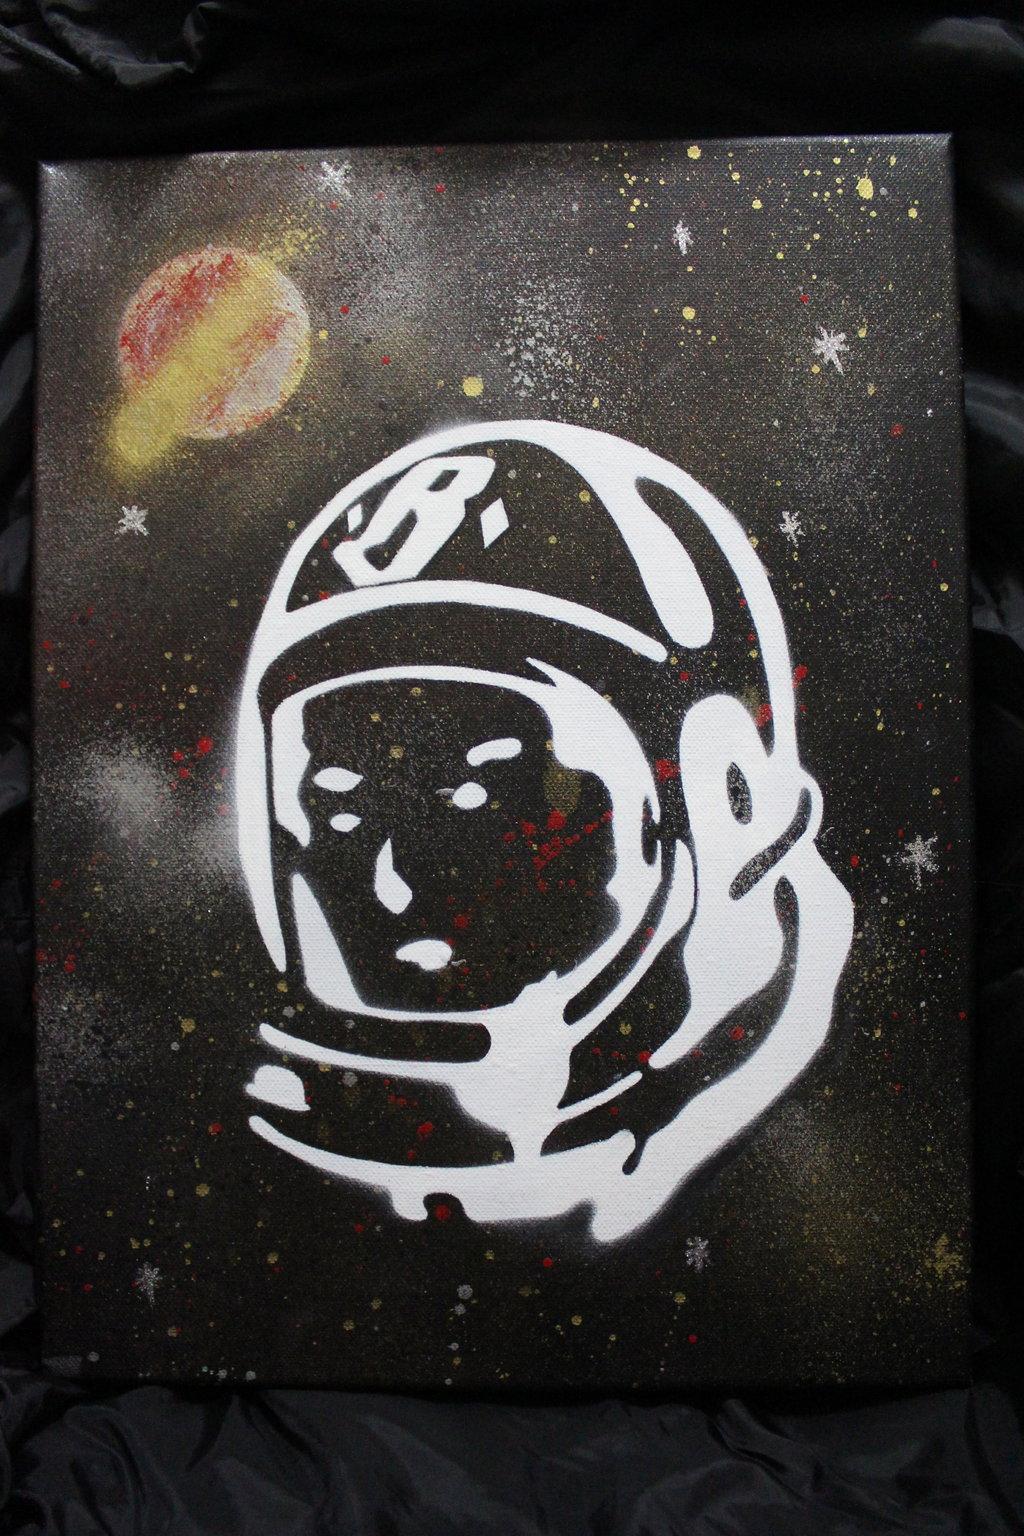 billionaire boys club astronaut logo - photo #33